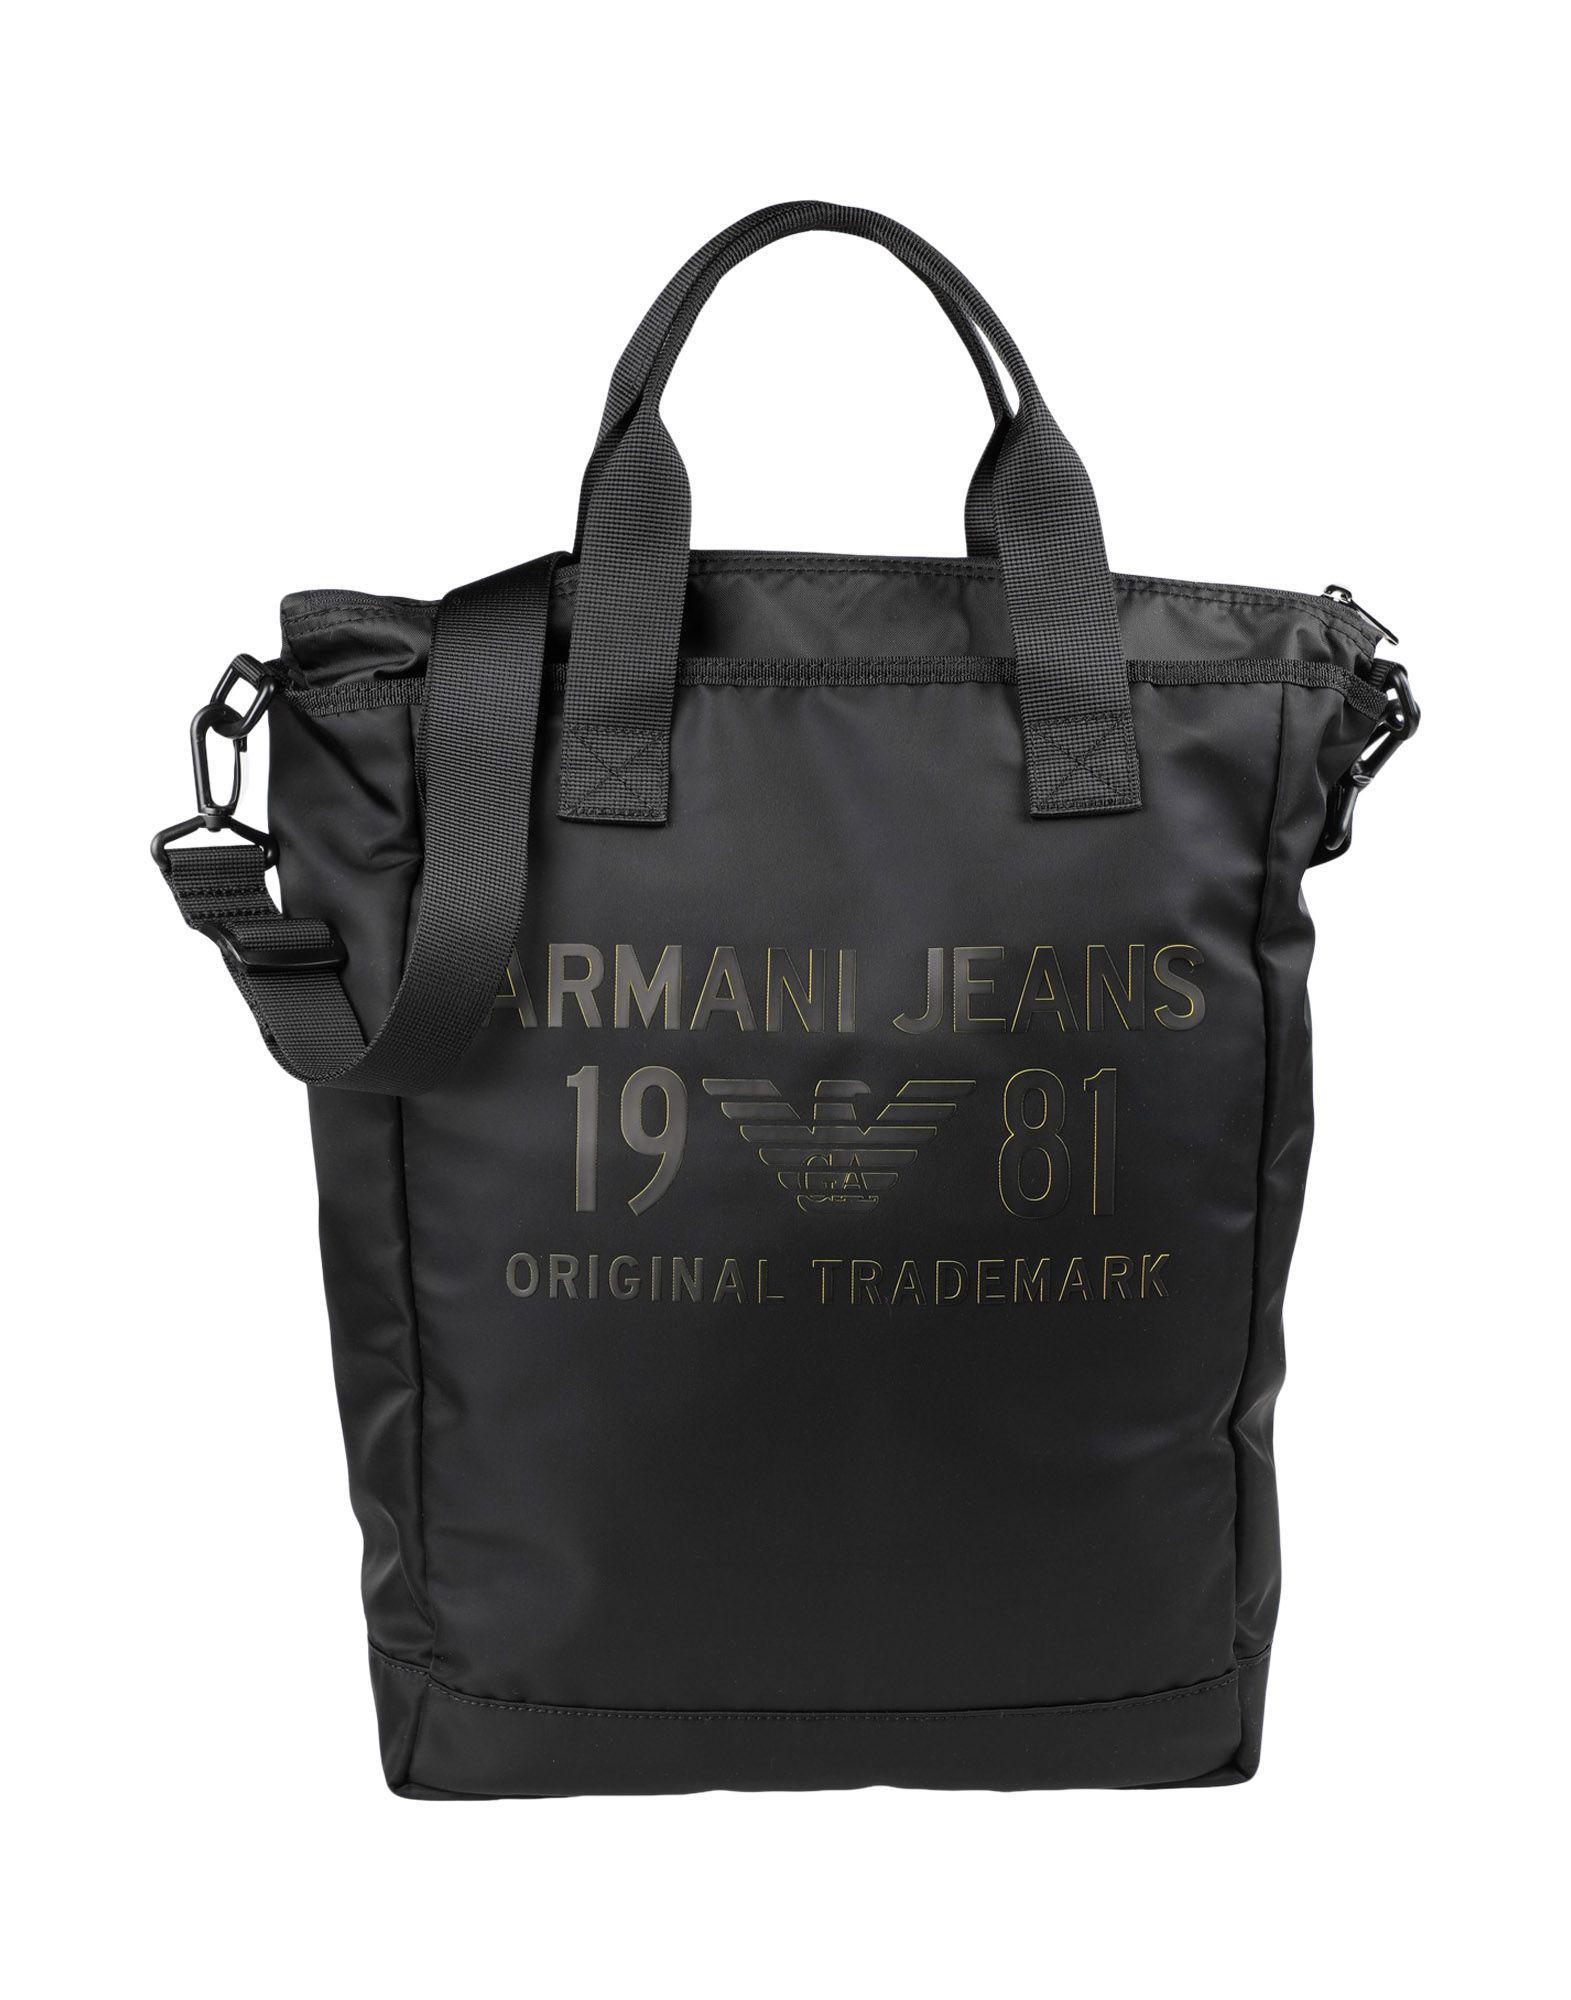 79e70f95a9a Lyst - Armani Jeans Cross-body Bag in Black for Men